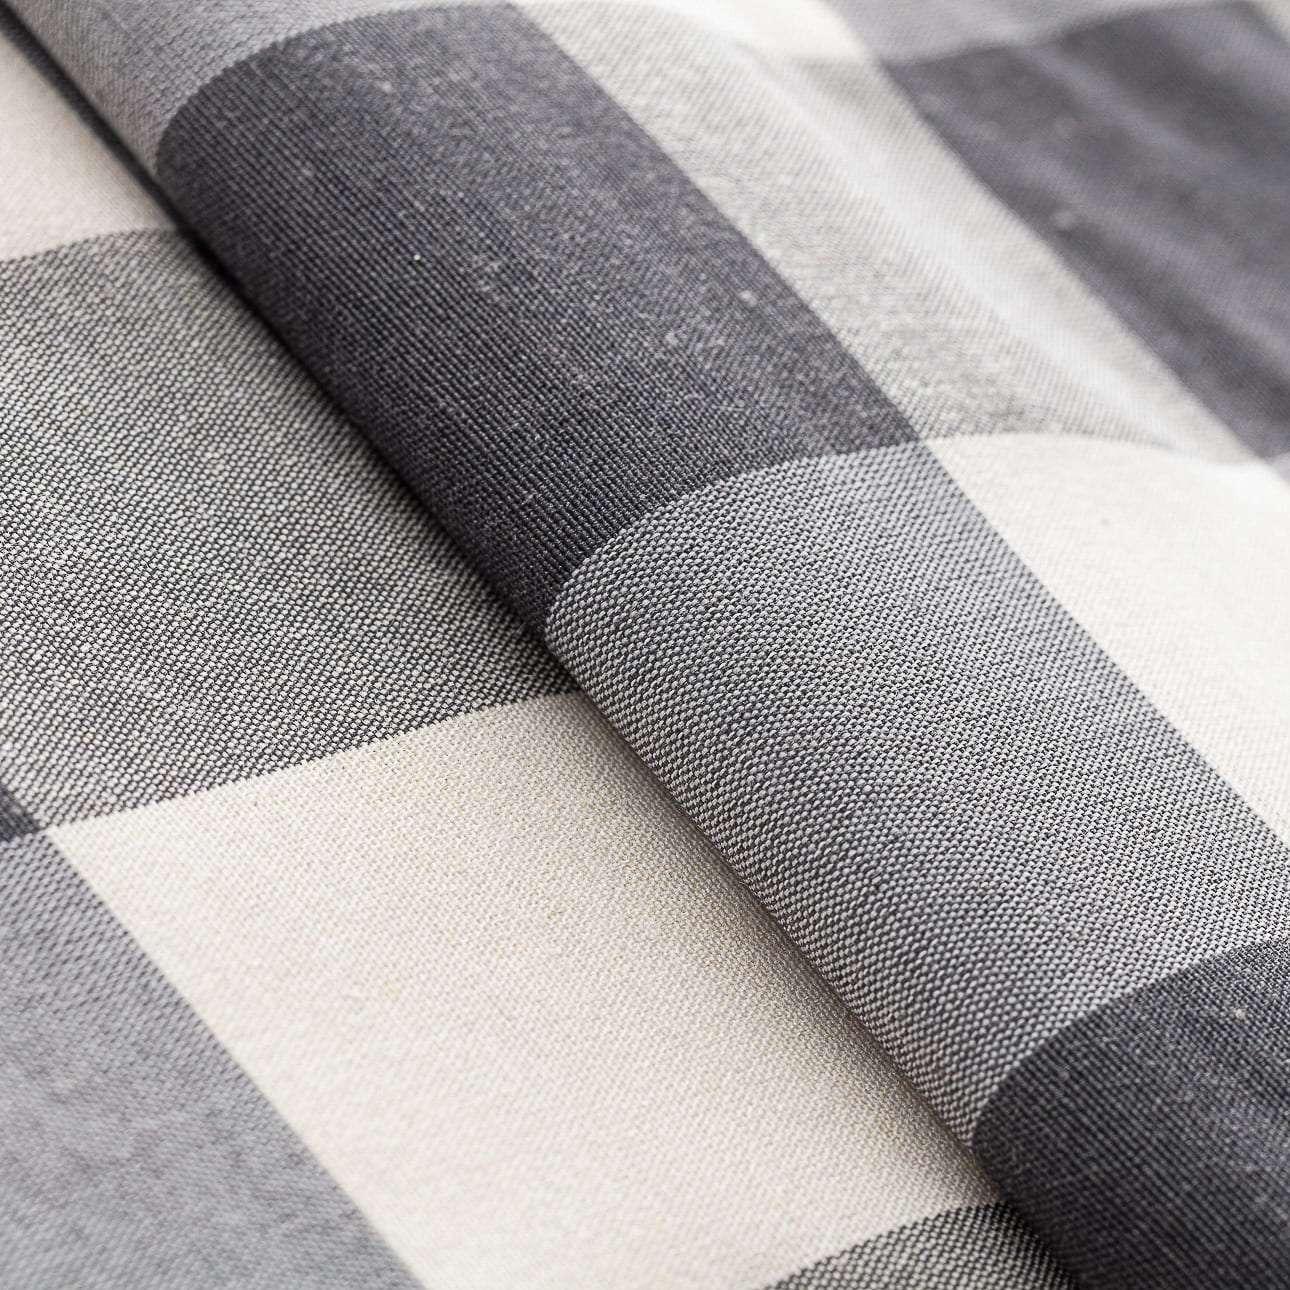 Sedák na stoličku Ingolf V kolekcii Quadro, tkanina: 136-13